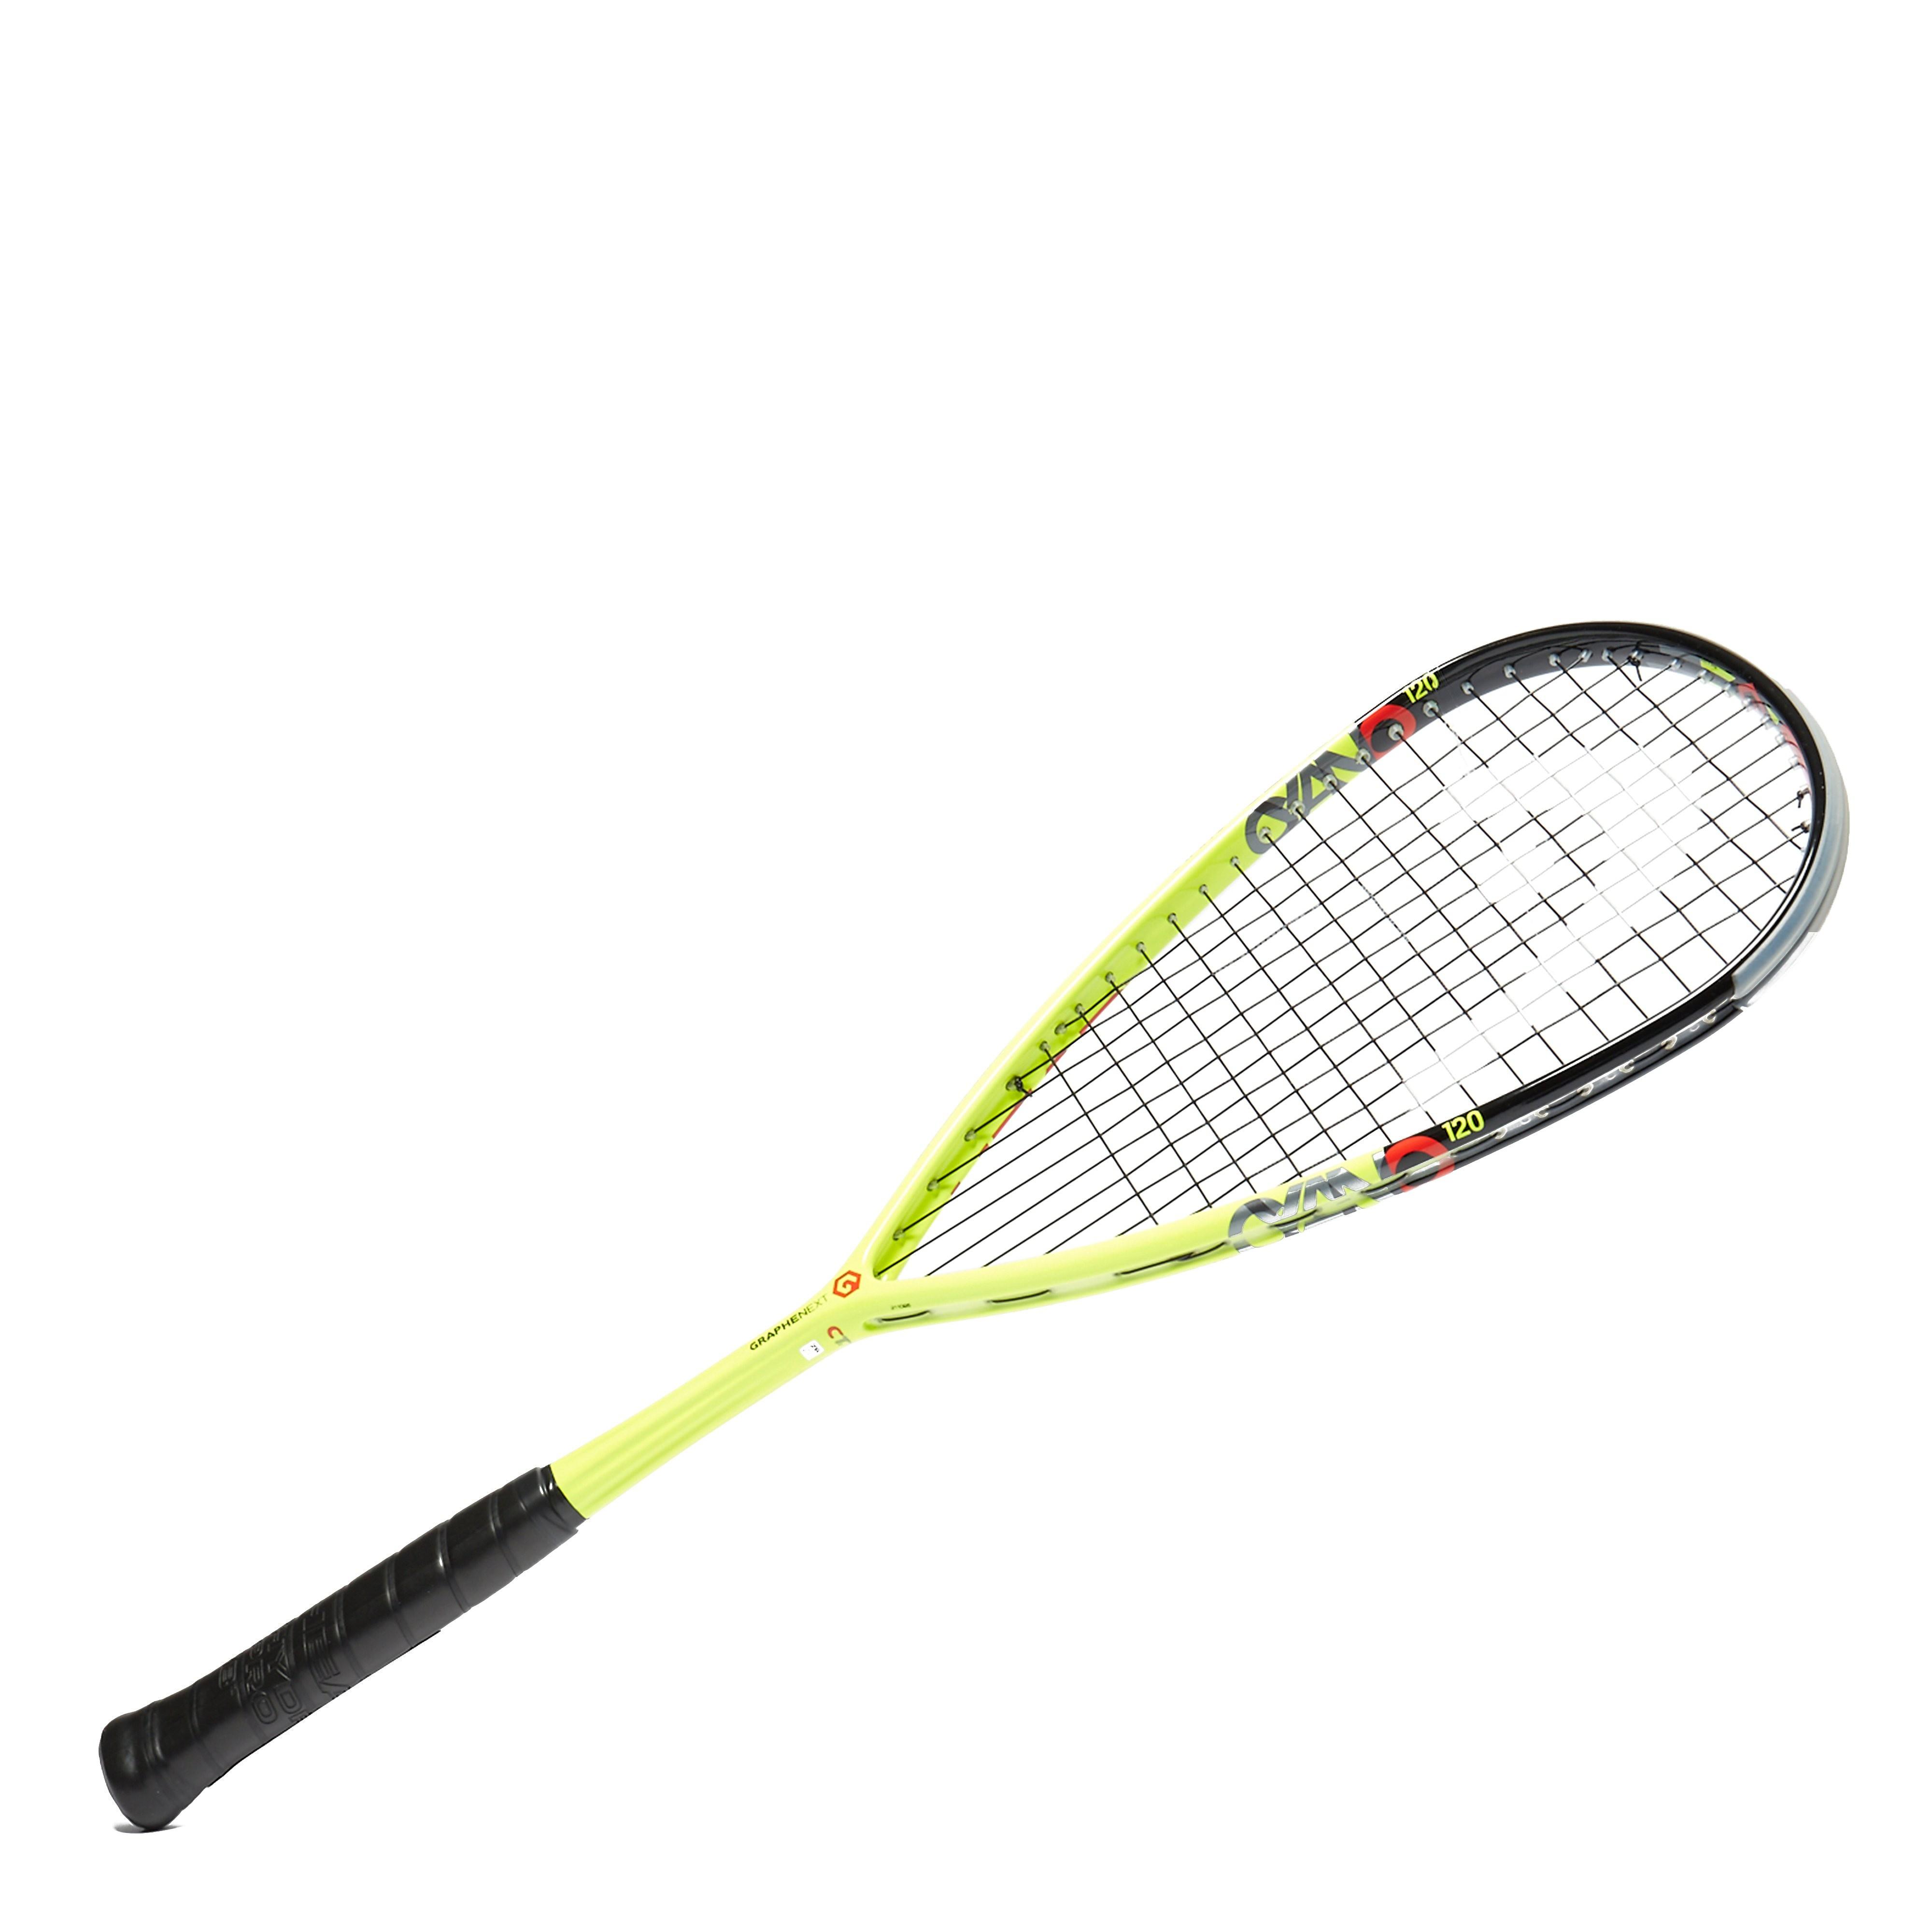 Head GRAPHENE XT CYANO 120 Squash Racket